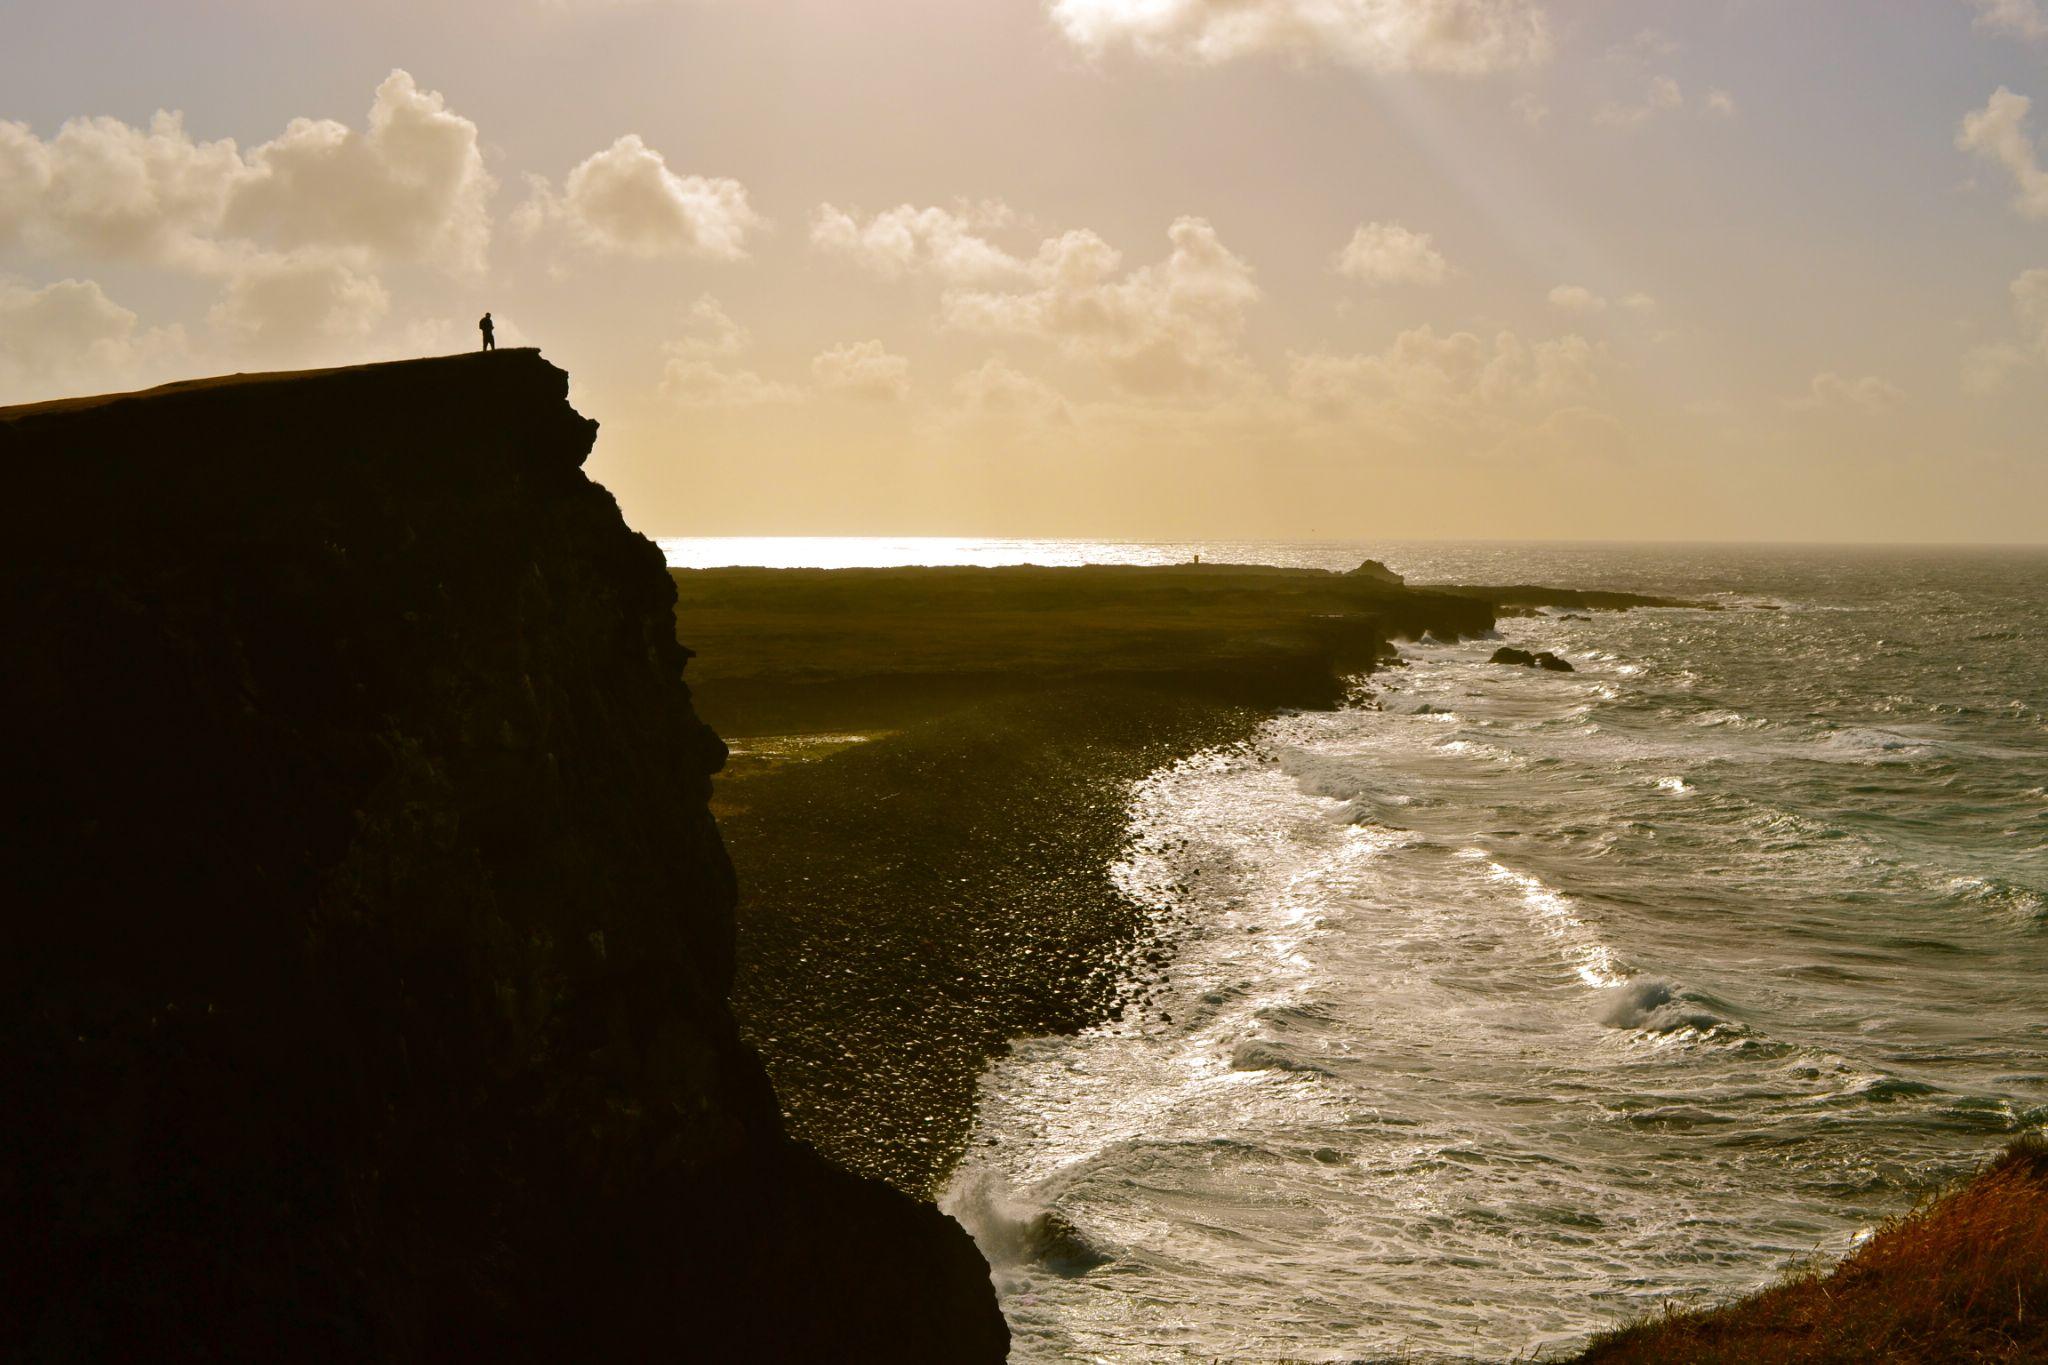 Purveying over the Atlantic by TyrellHeaton